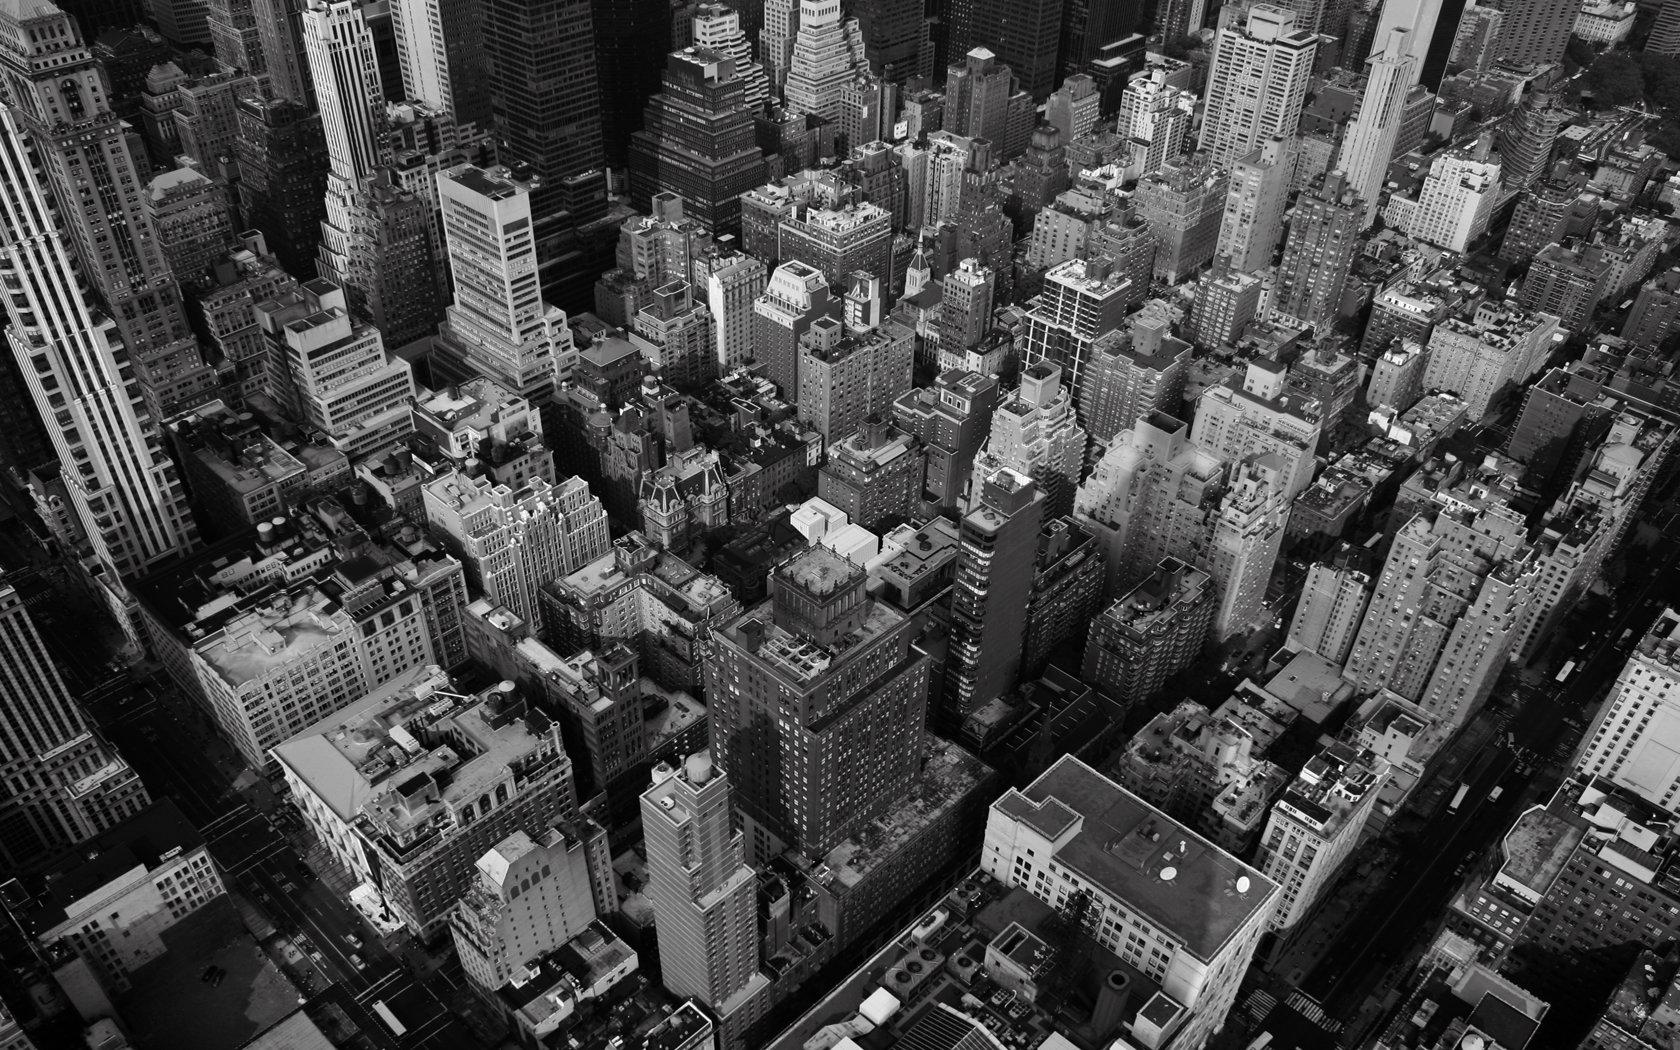 Download Hd 1680x1050 New York Desktop Wallpaper Id 486262 For Free